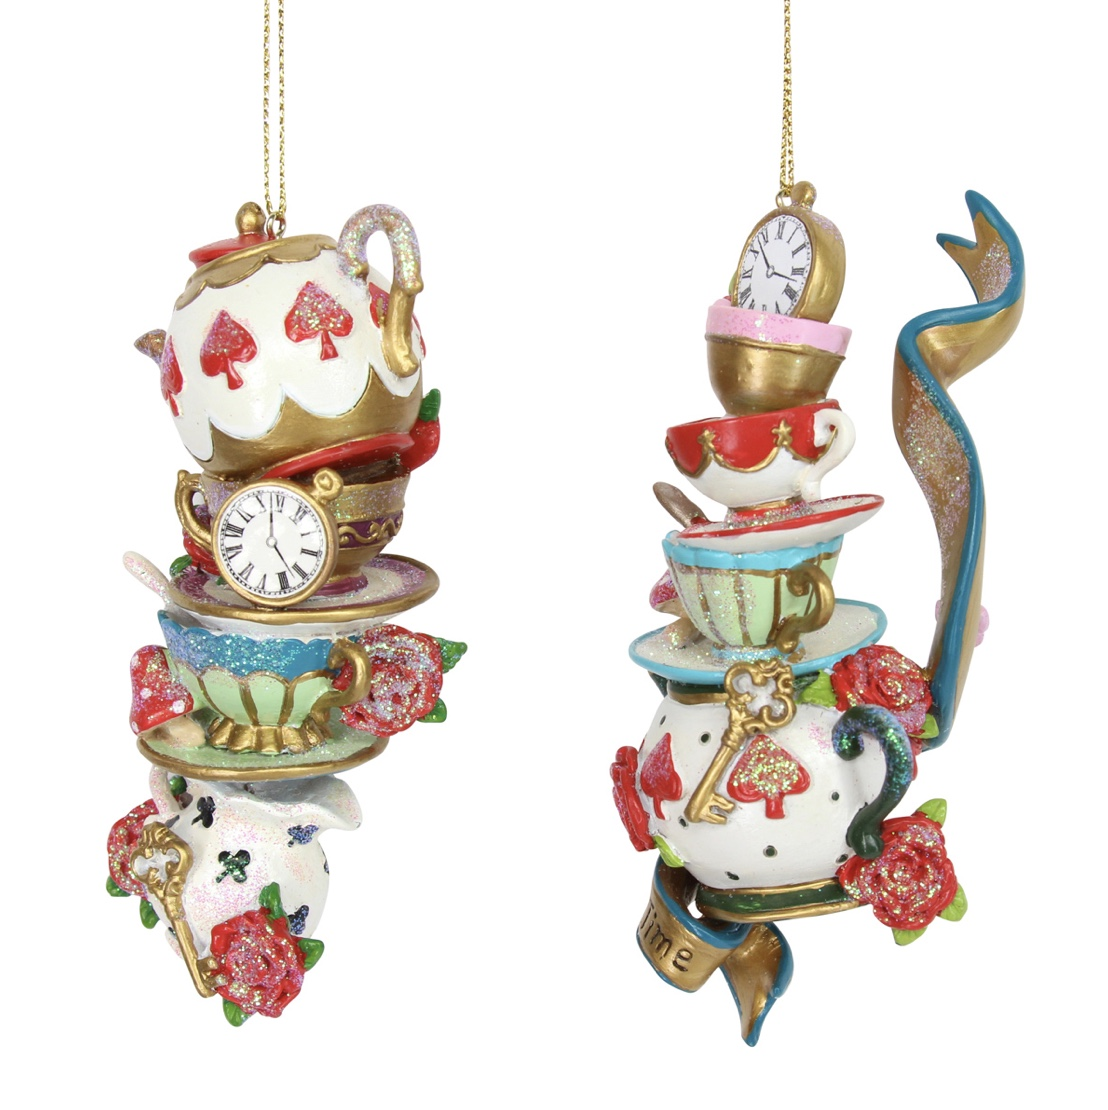 Alice in Wonderland - Tea Party Stacks